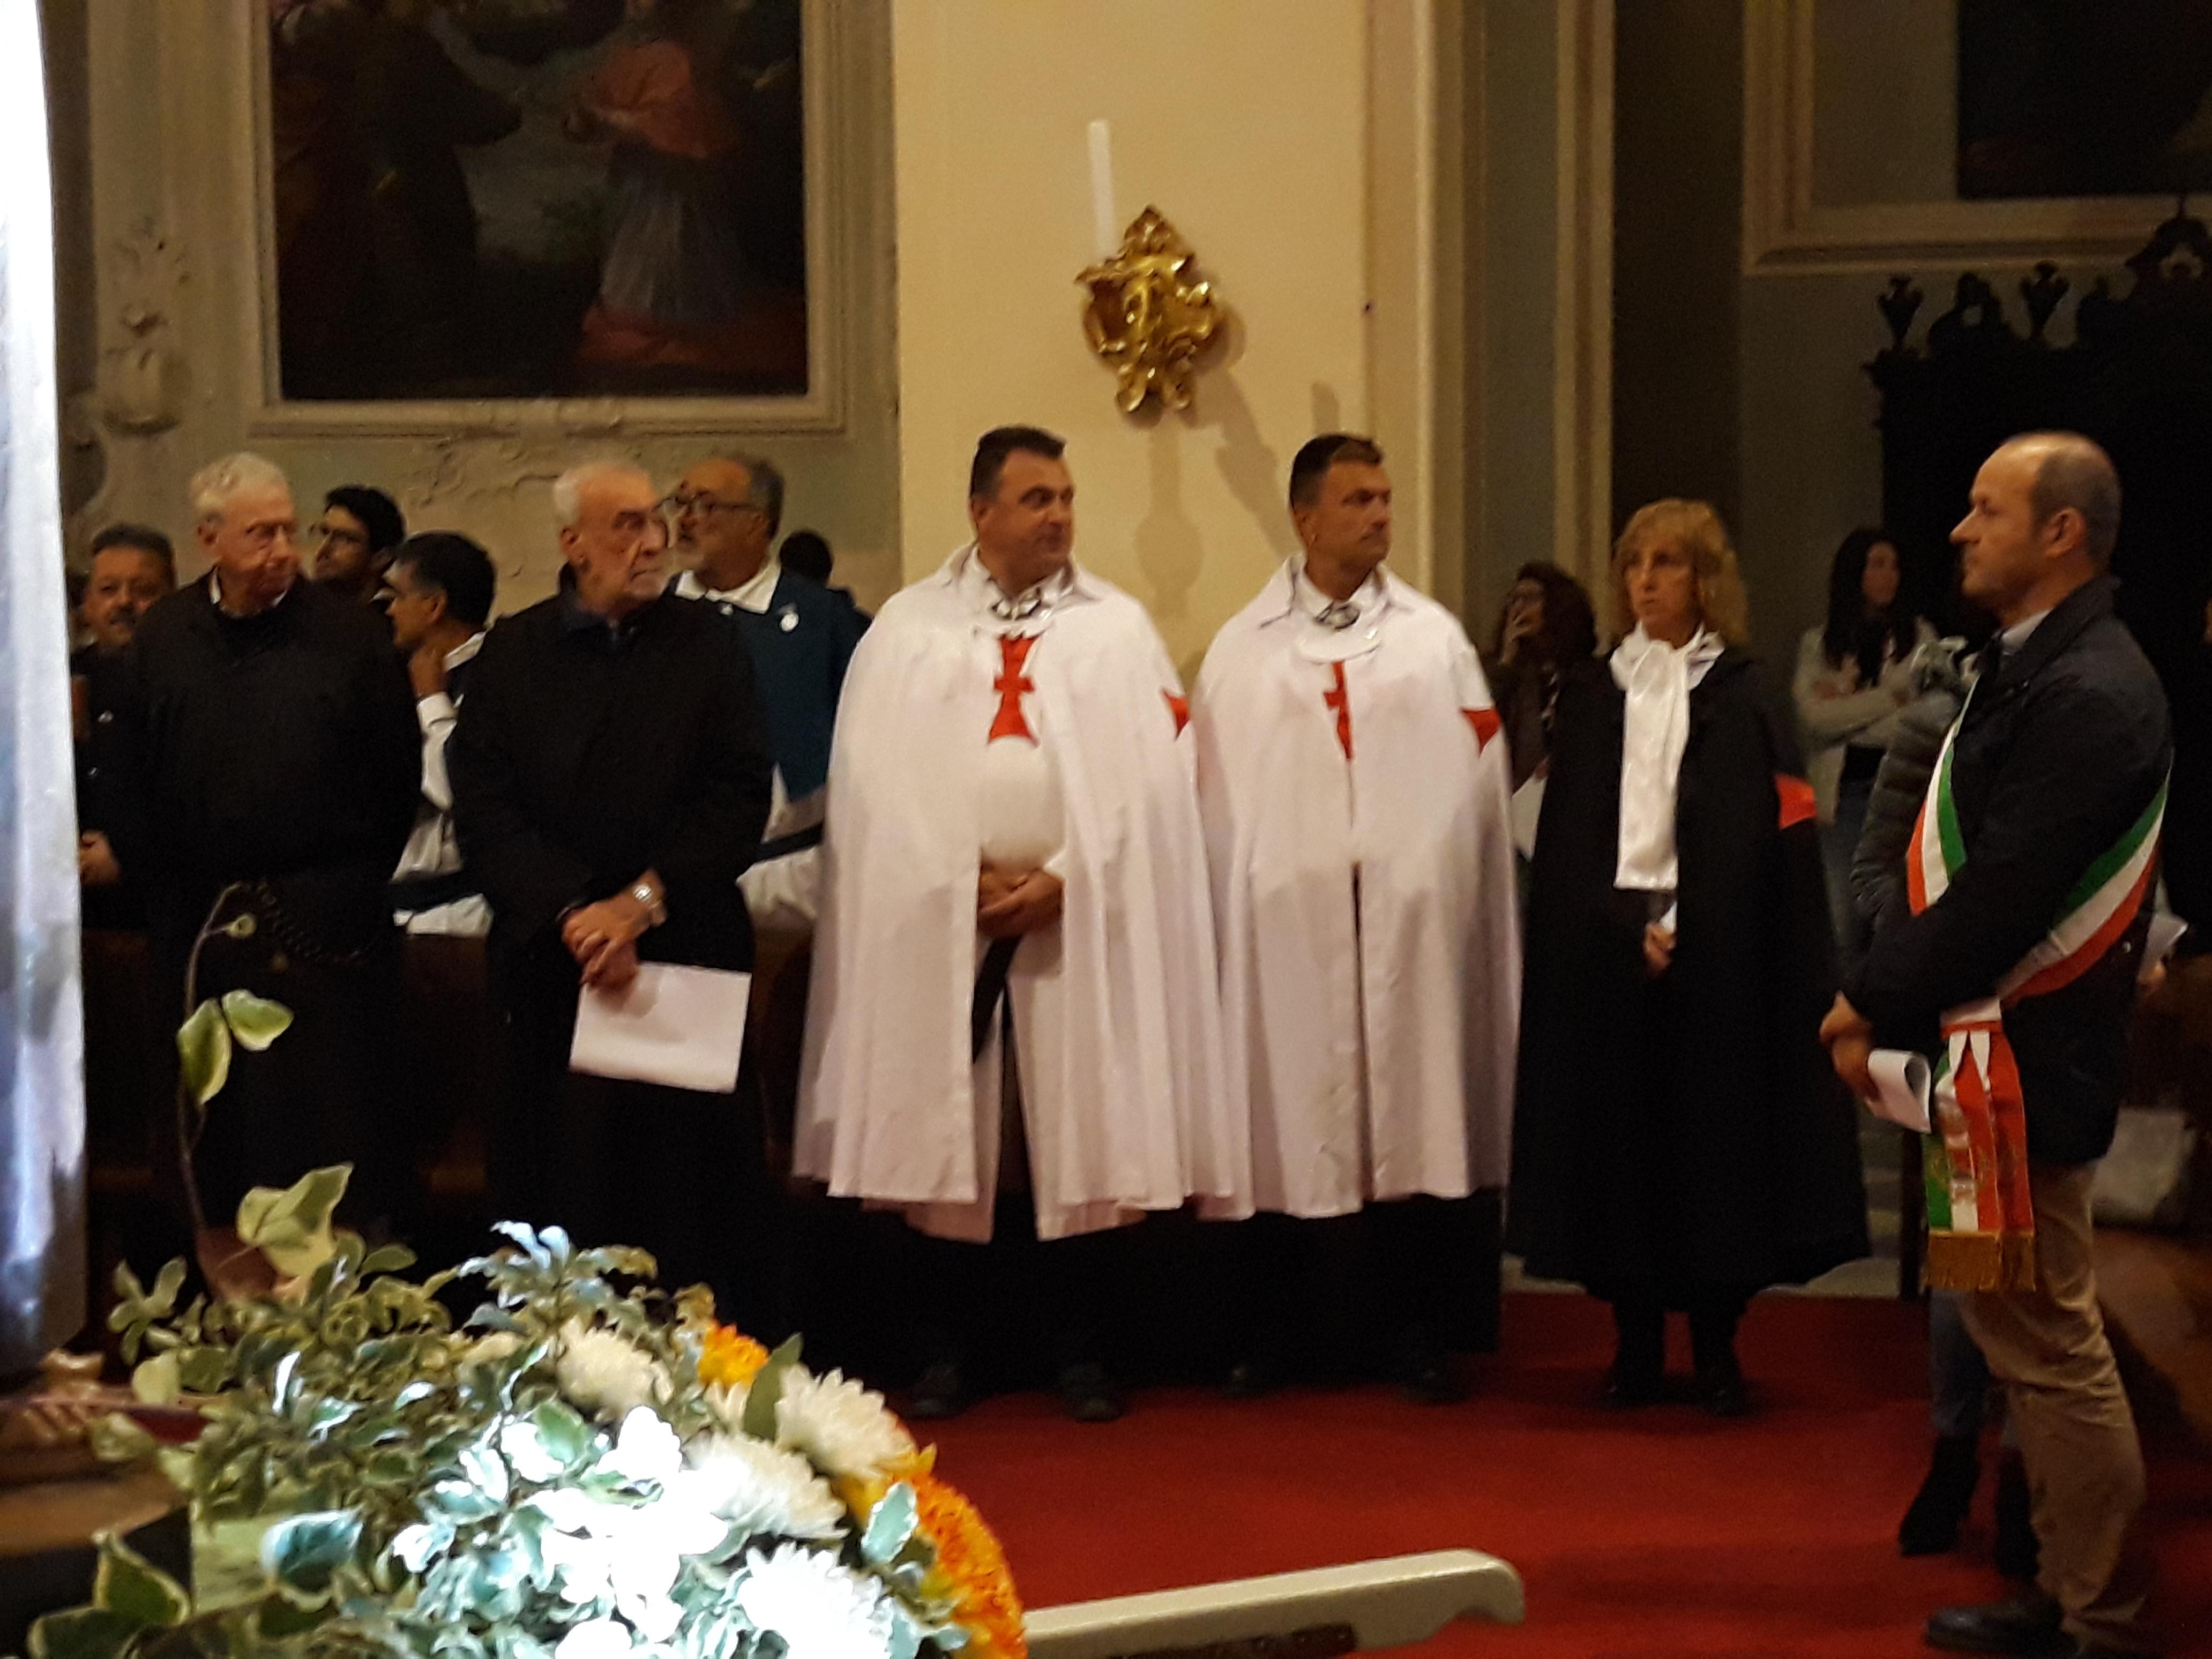 Transito di San Francesco – Pontremoli (MS) 03.10.2019